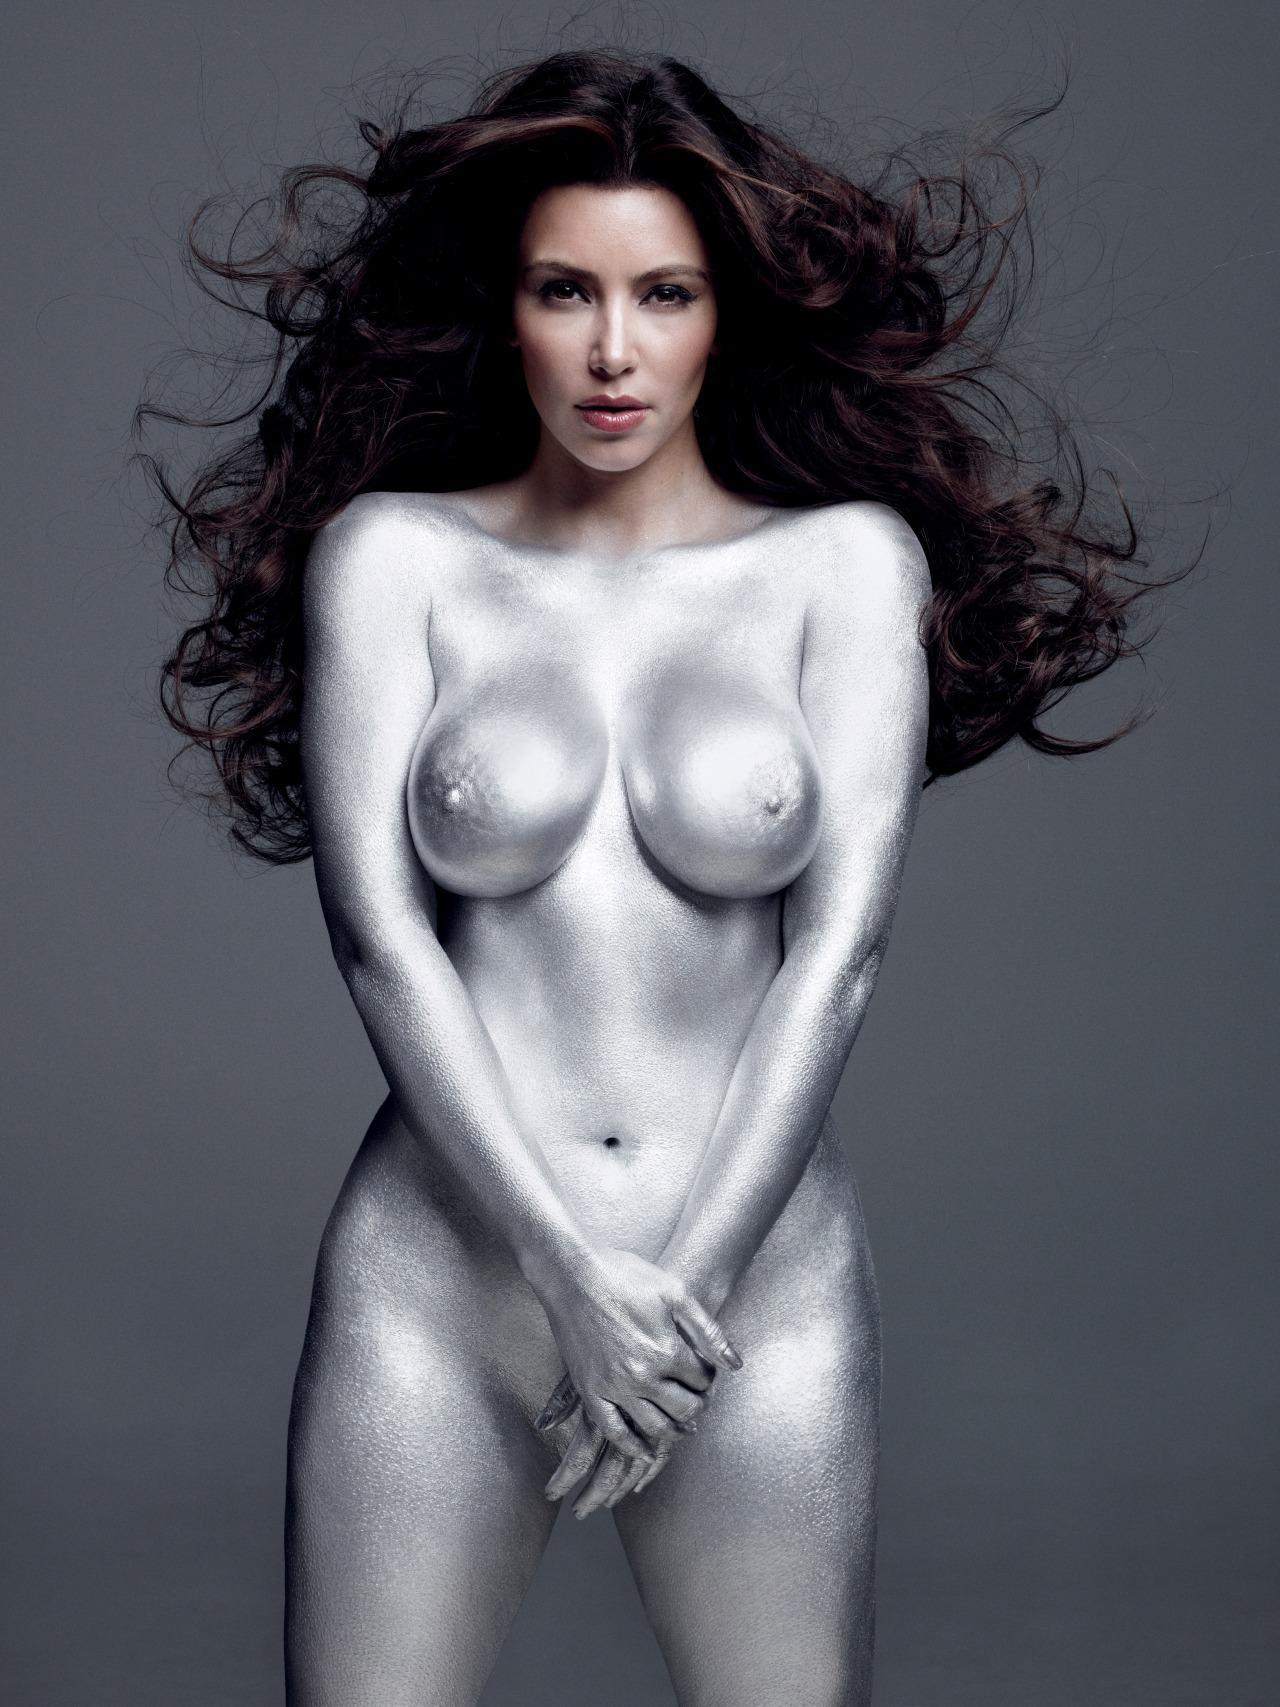 Kim Kardashian Nude Body Paint Photoshoot Leaked Fdcsbq